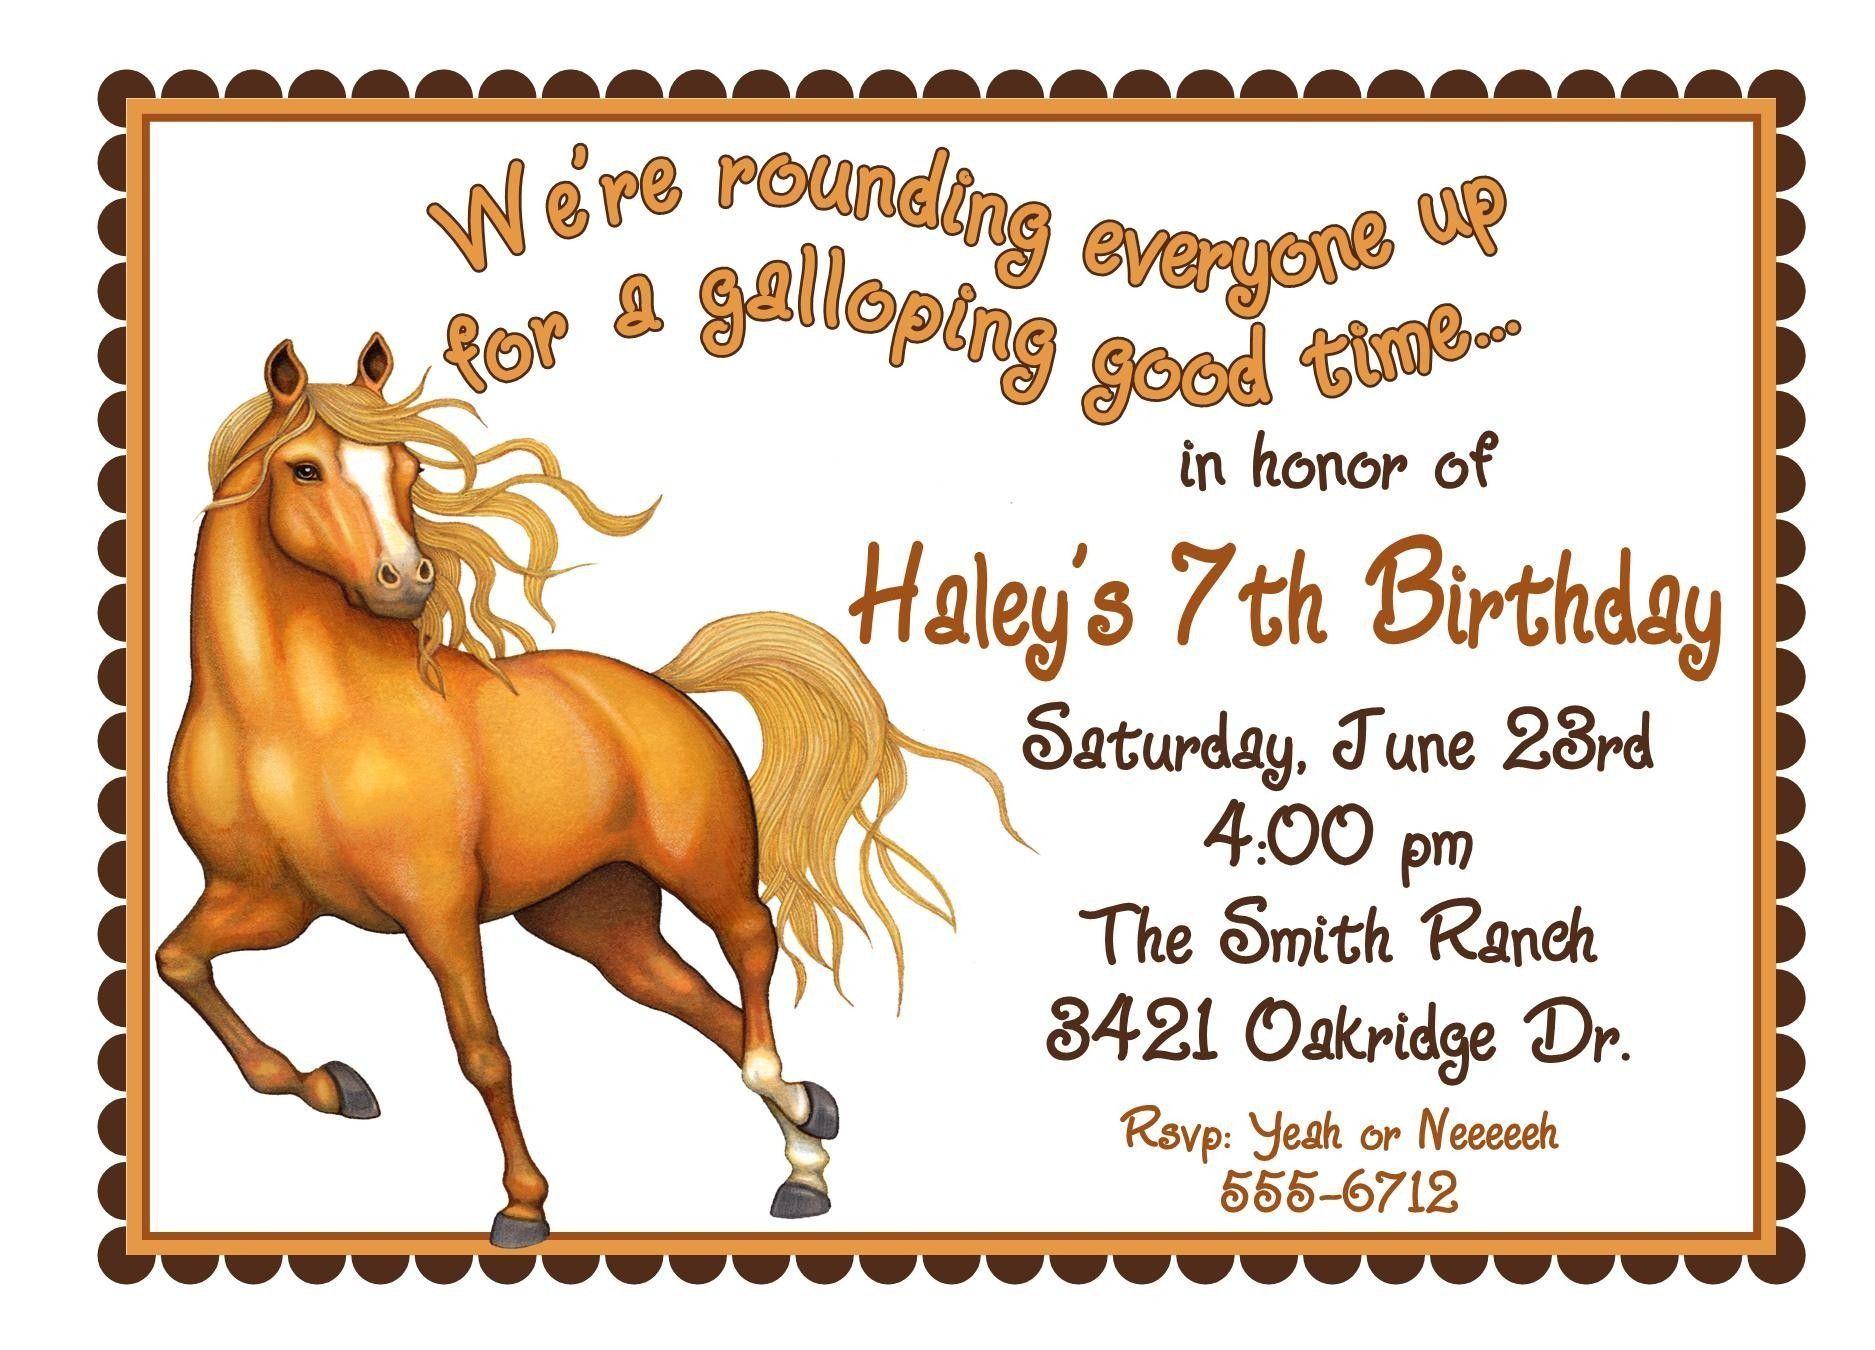 Free Printable Horse Birthday Invitations   Birthday Invitations - Free Printable Horse Themed Birthday Party Invitations